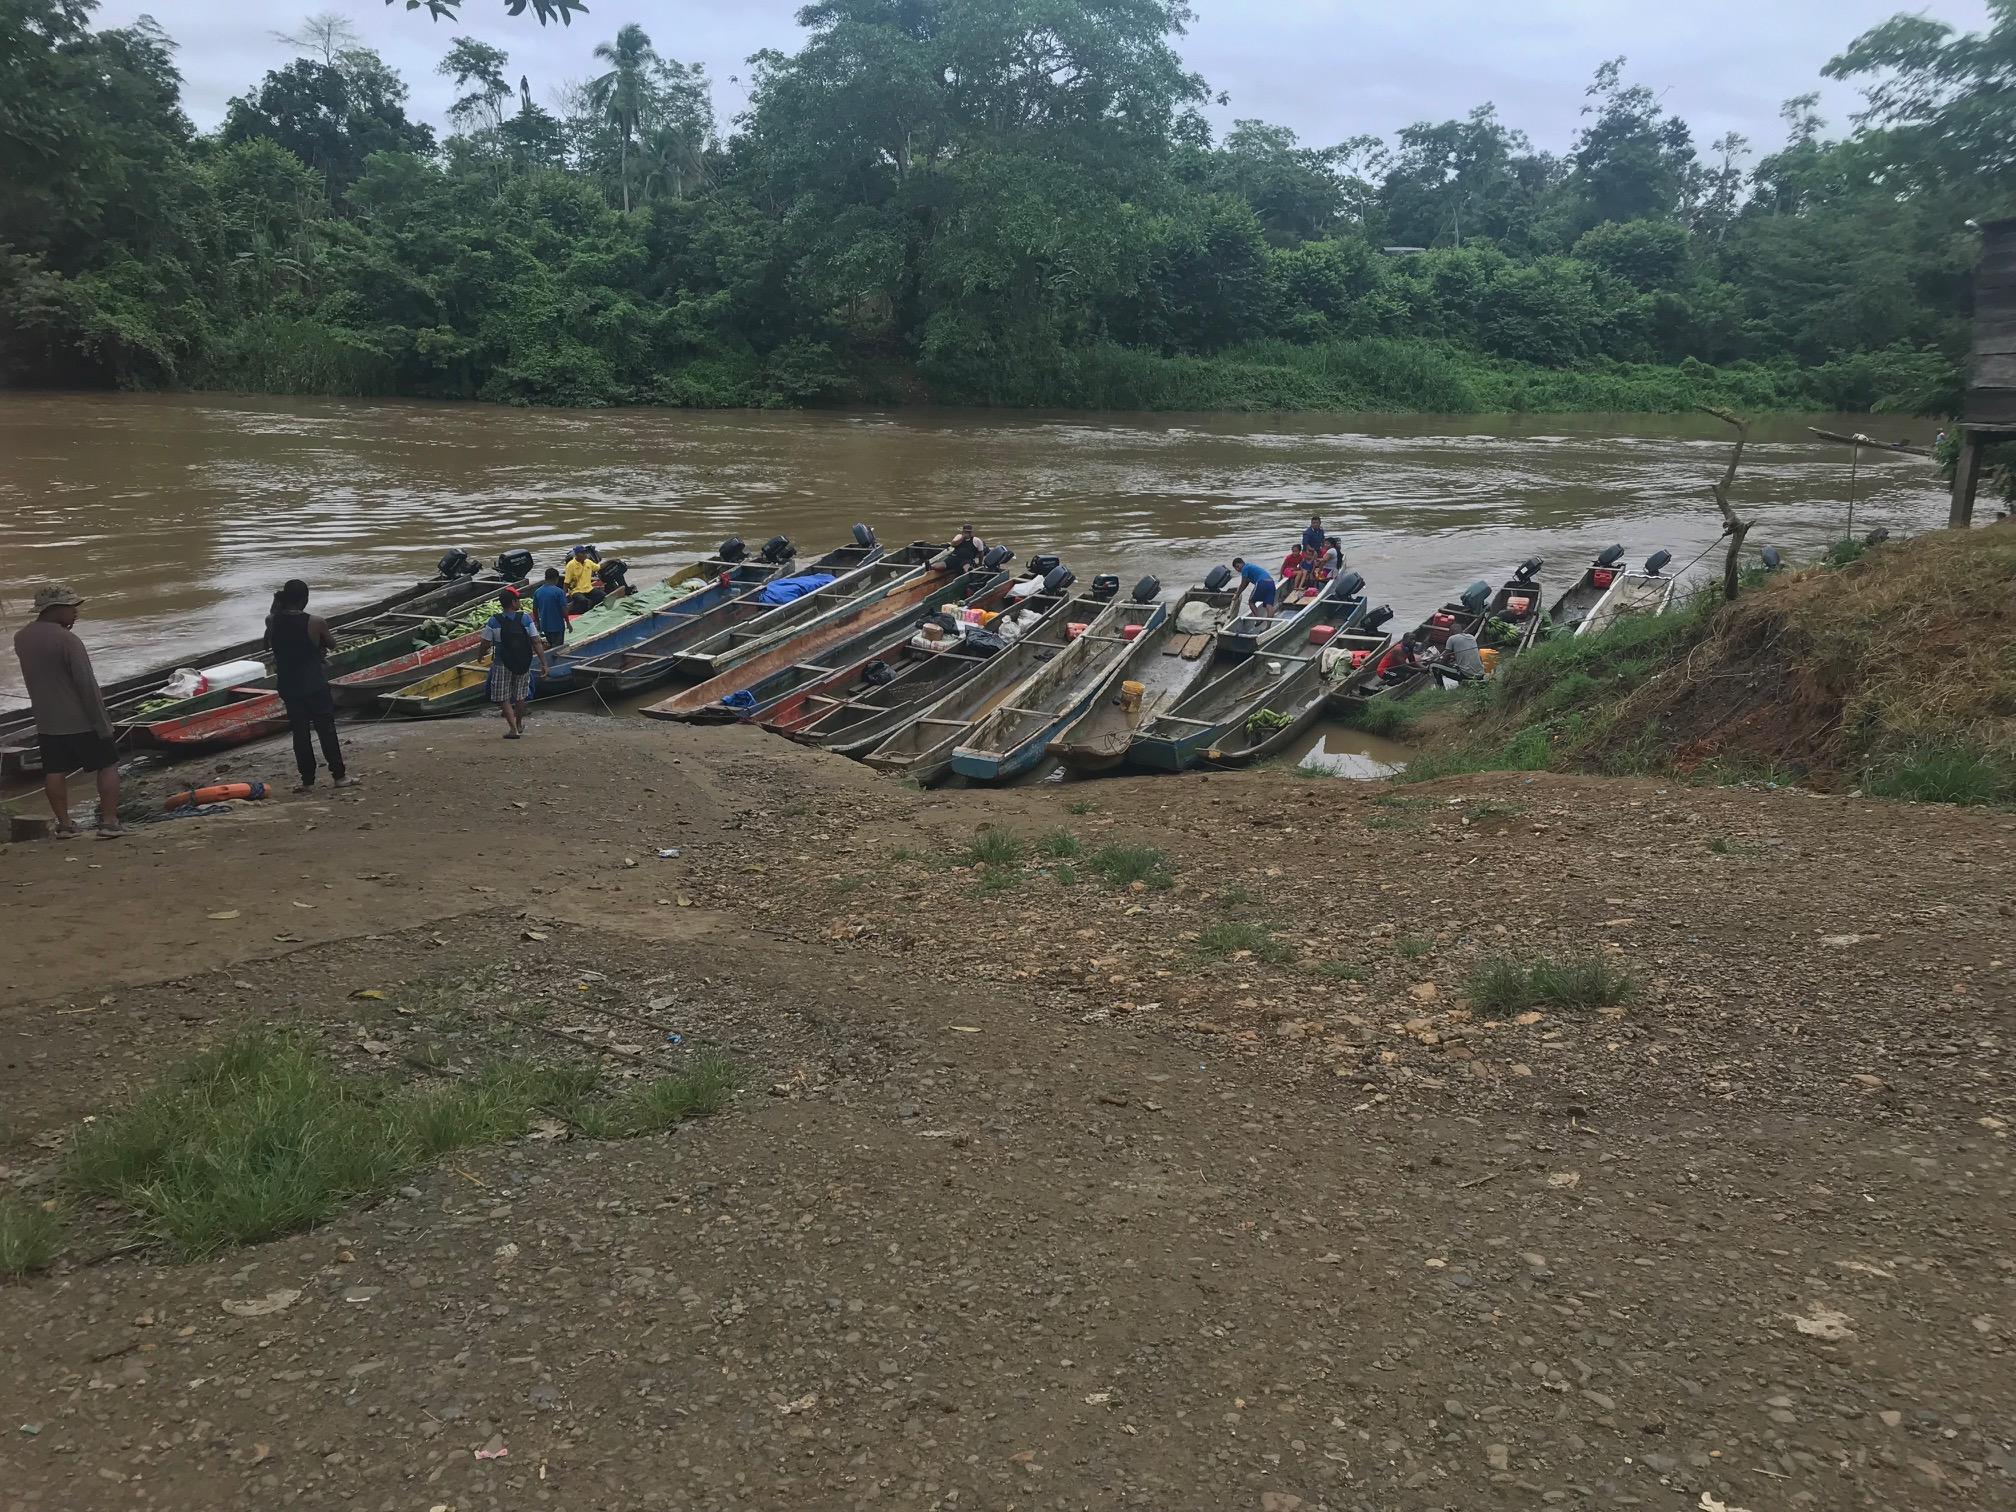 Boats along a river in the Darien Gap, Panama